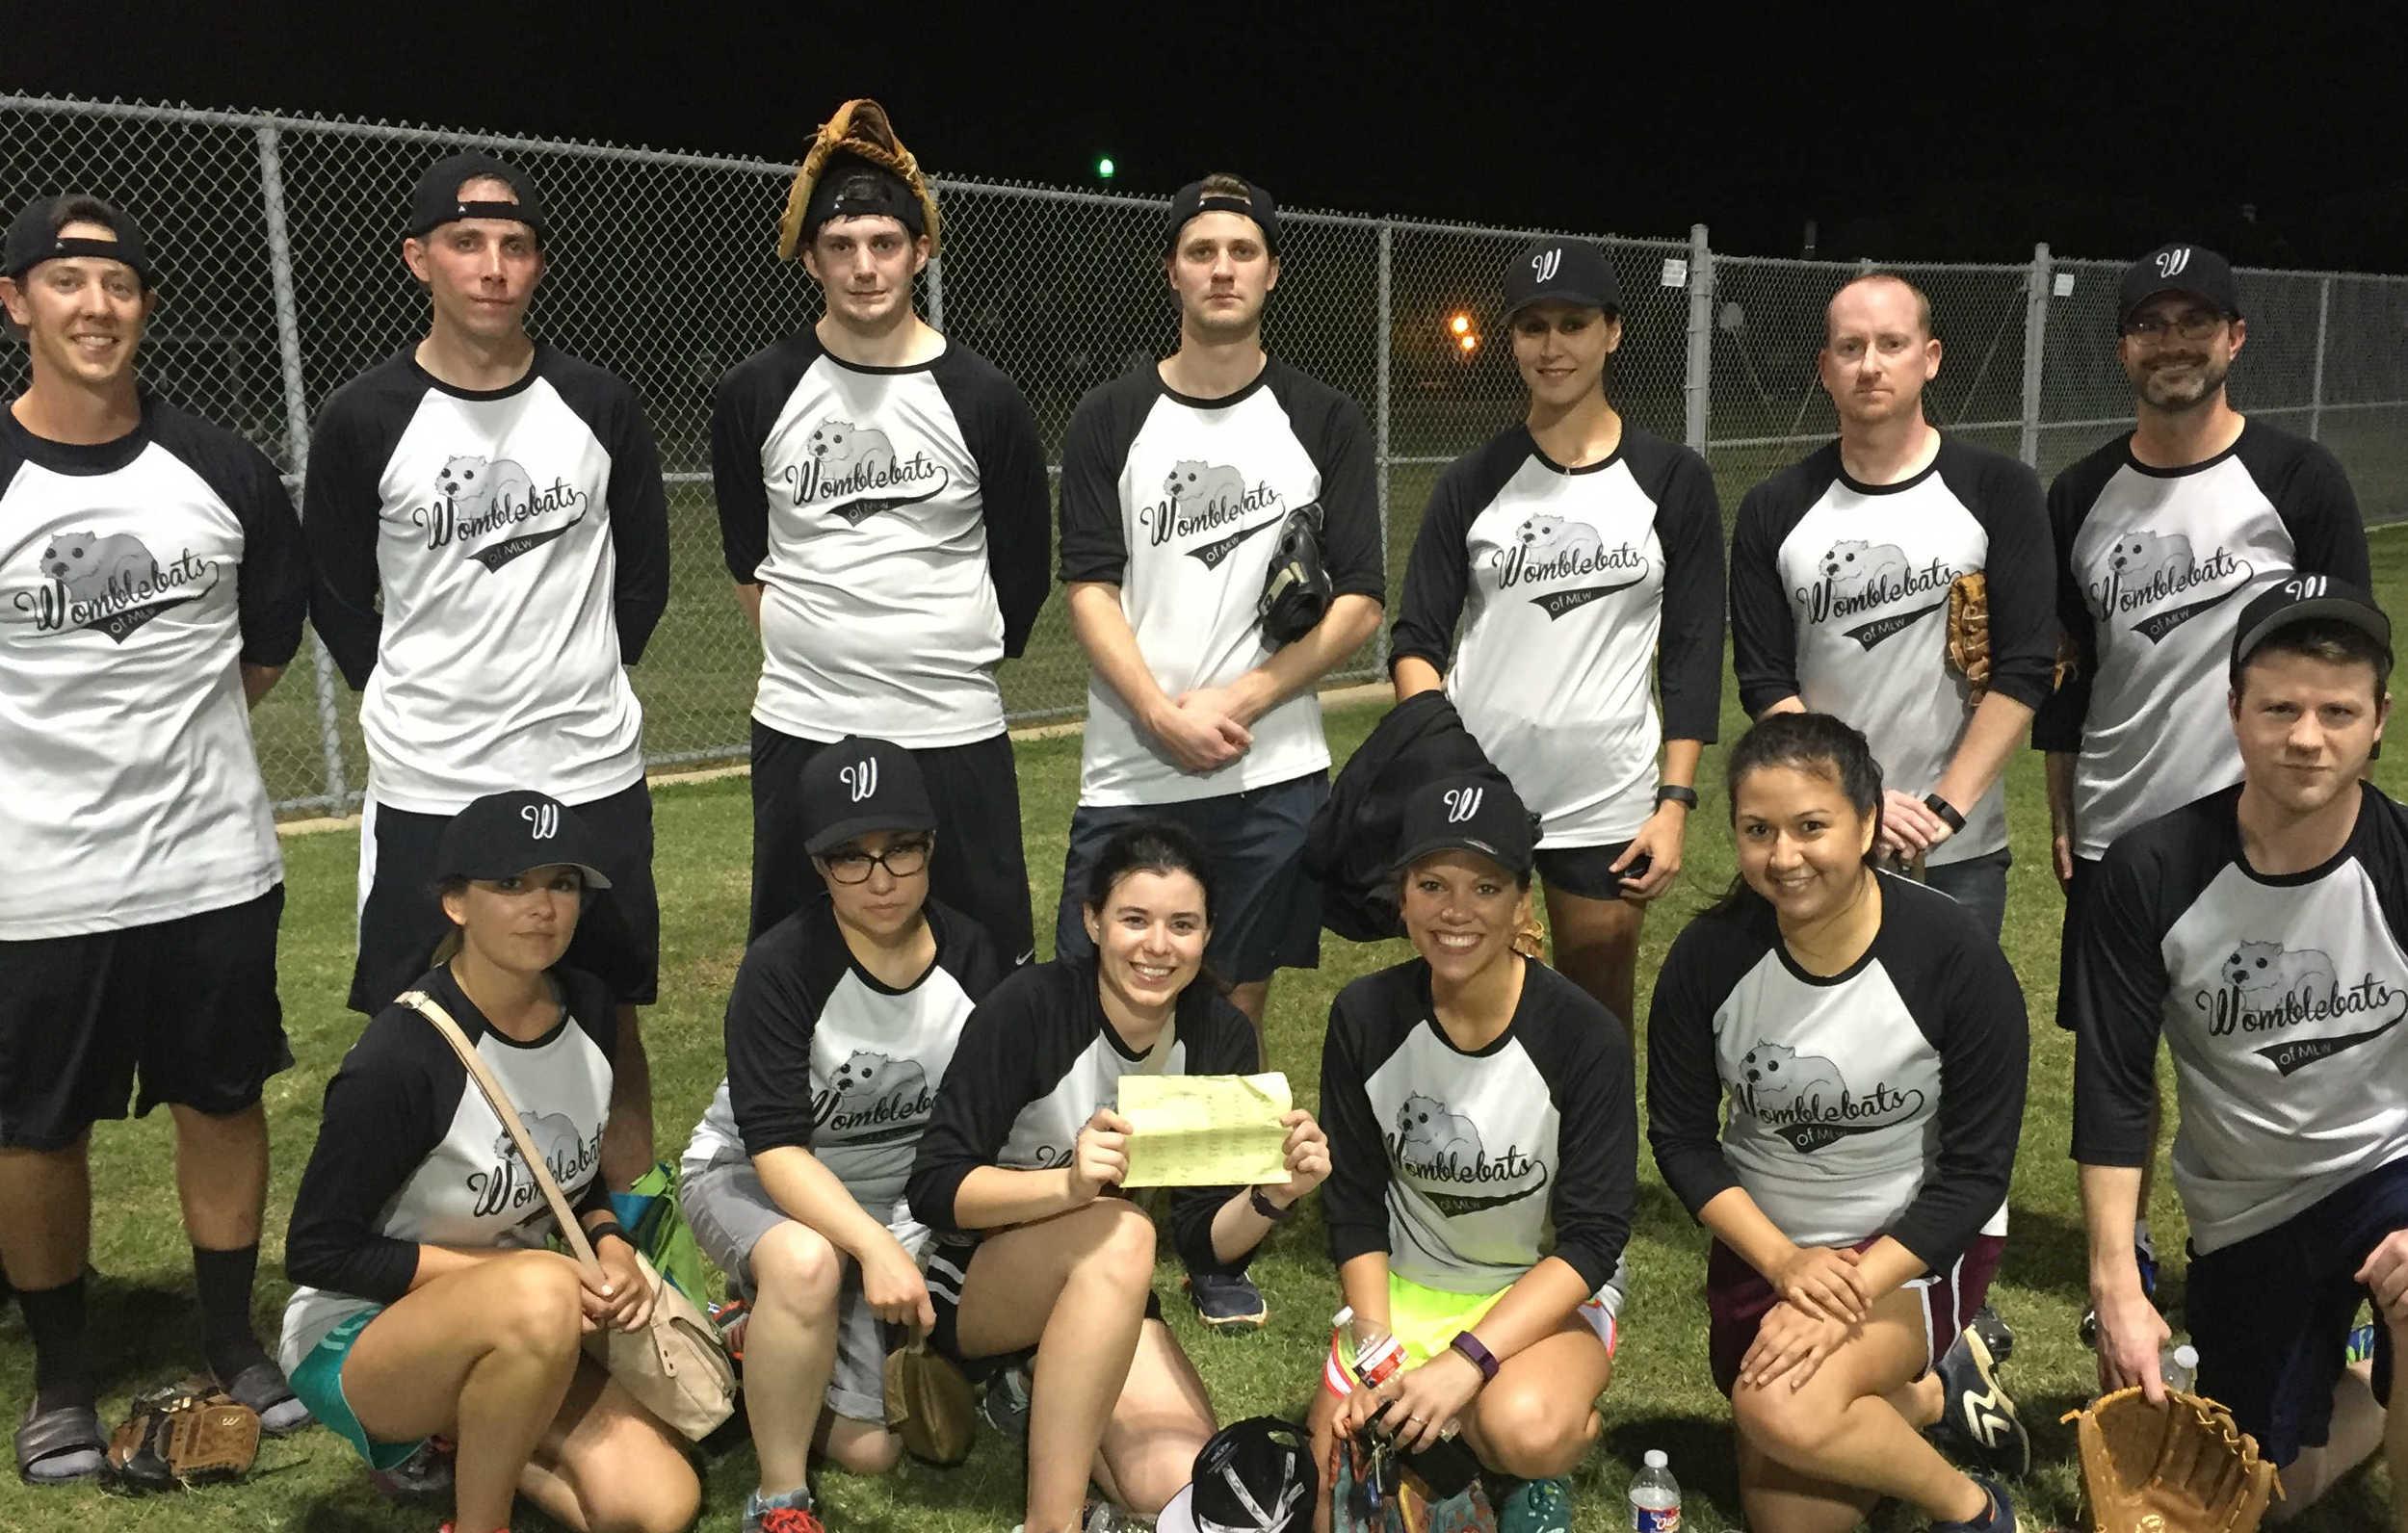 MLW_Softball2016.jpg